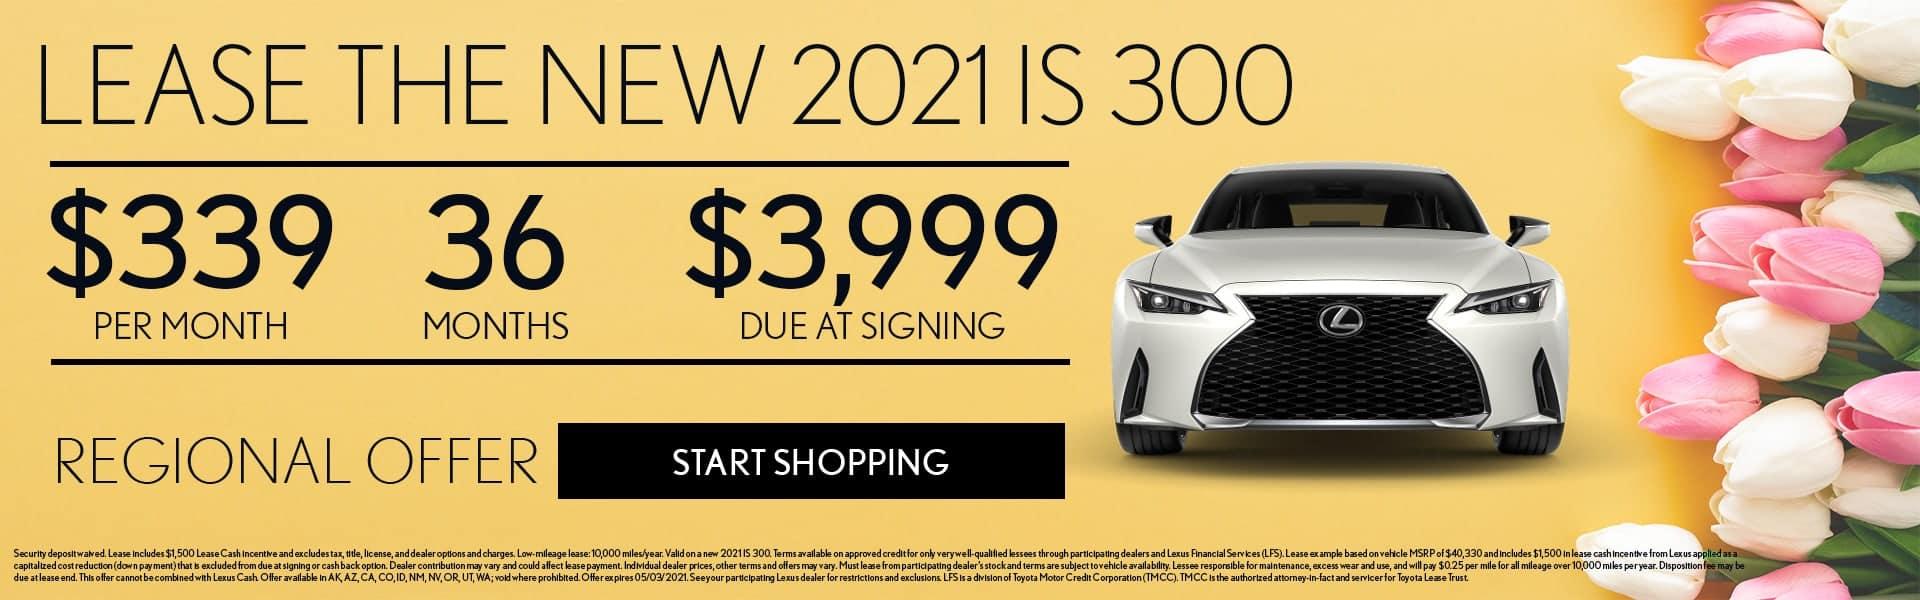 2021 Lexus IS offer